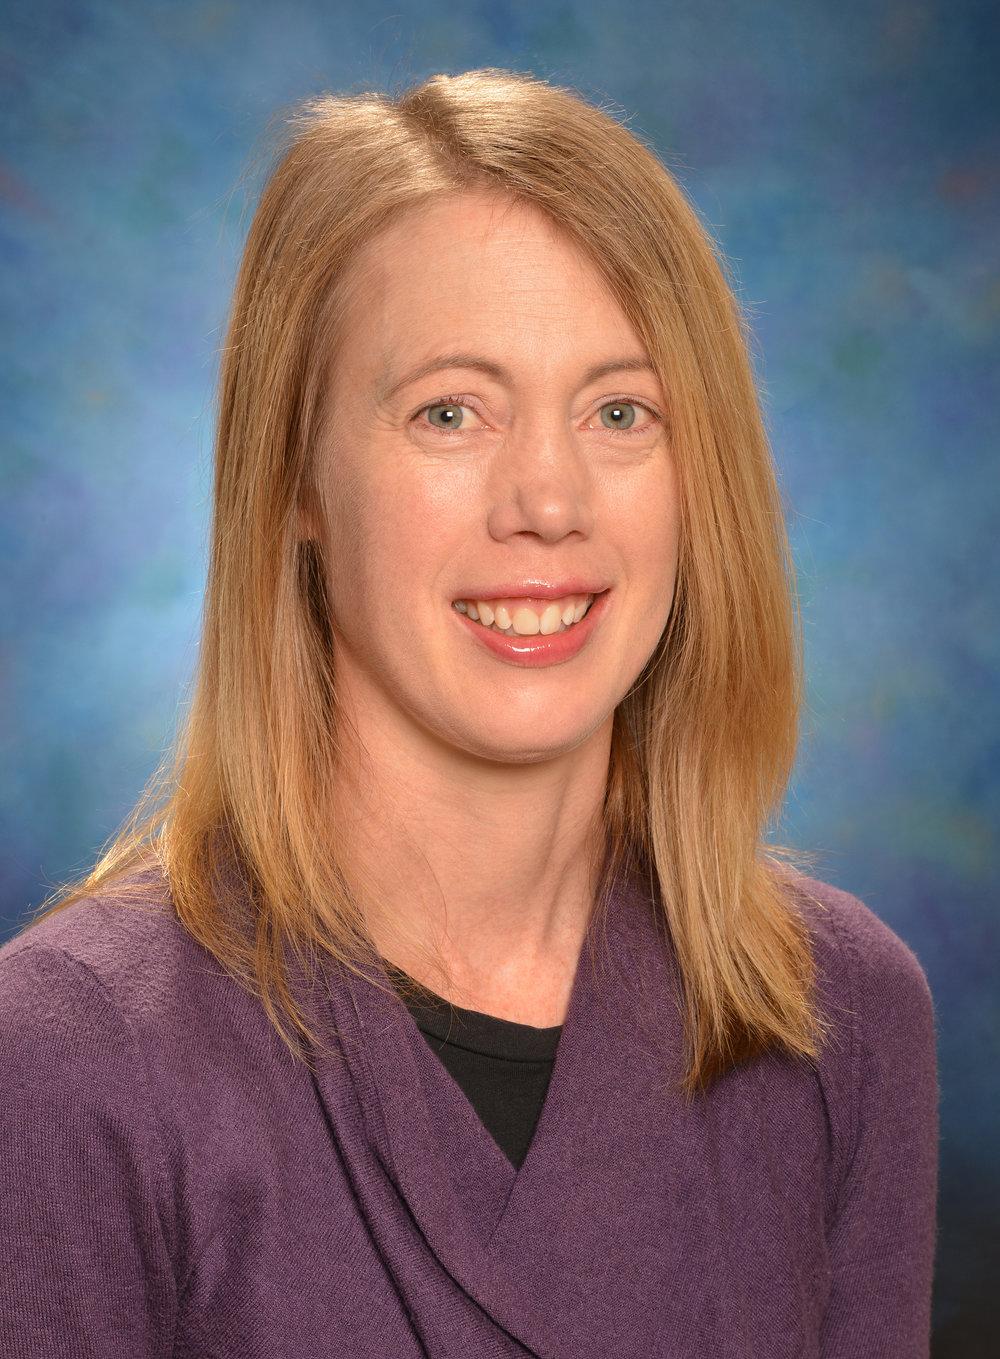 <p><b>Dr Alison Funston</b><br>Monash University<br>Capability Leader</p>